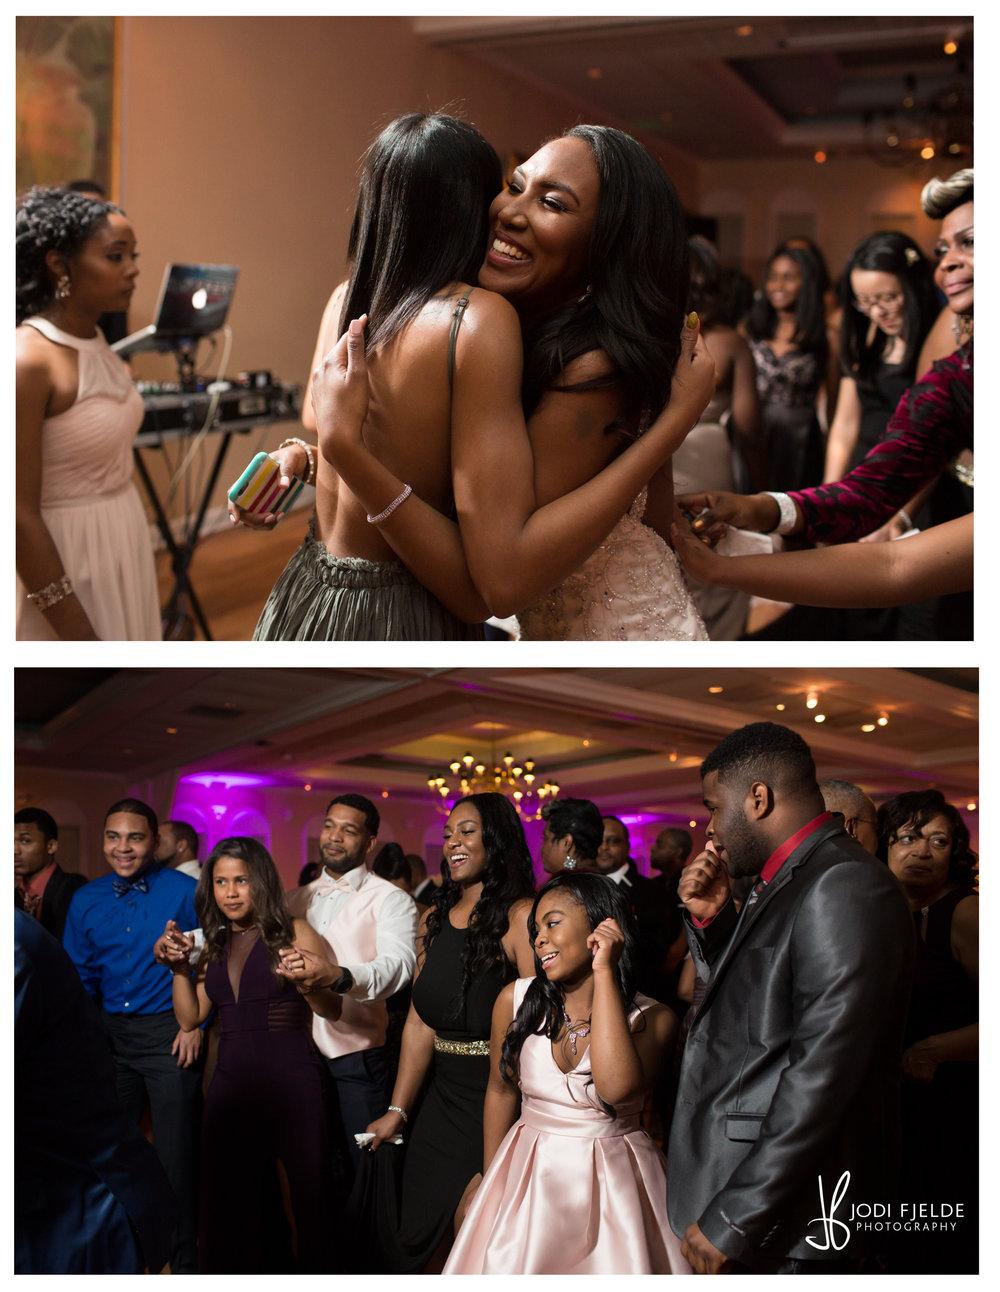 Benvenuto_wedding_Boynton_Beach_Jodi_Fjelde_Photography_Nikki_Otis_married_31.jpg